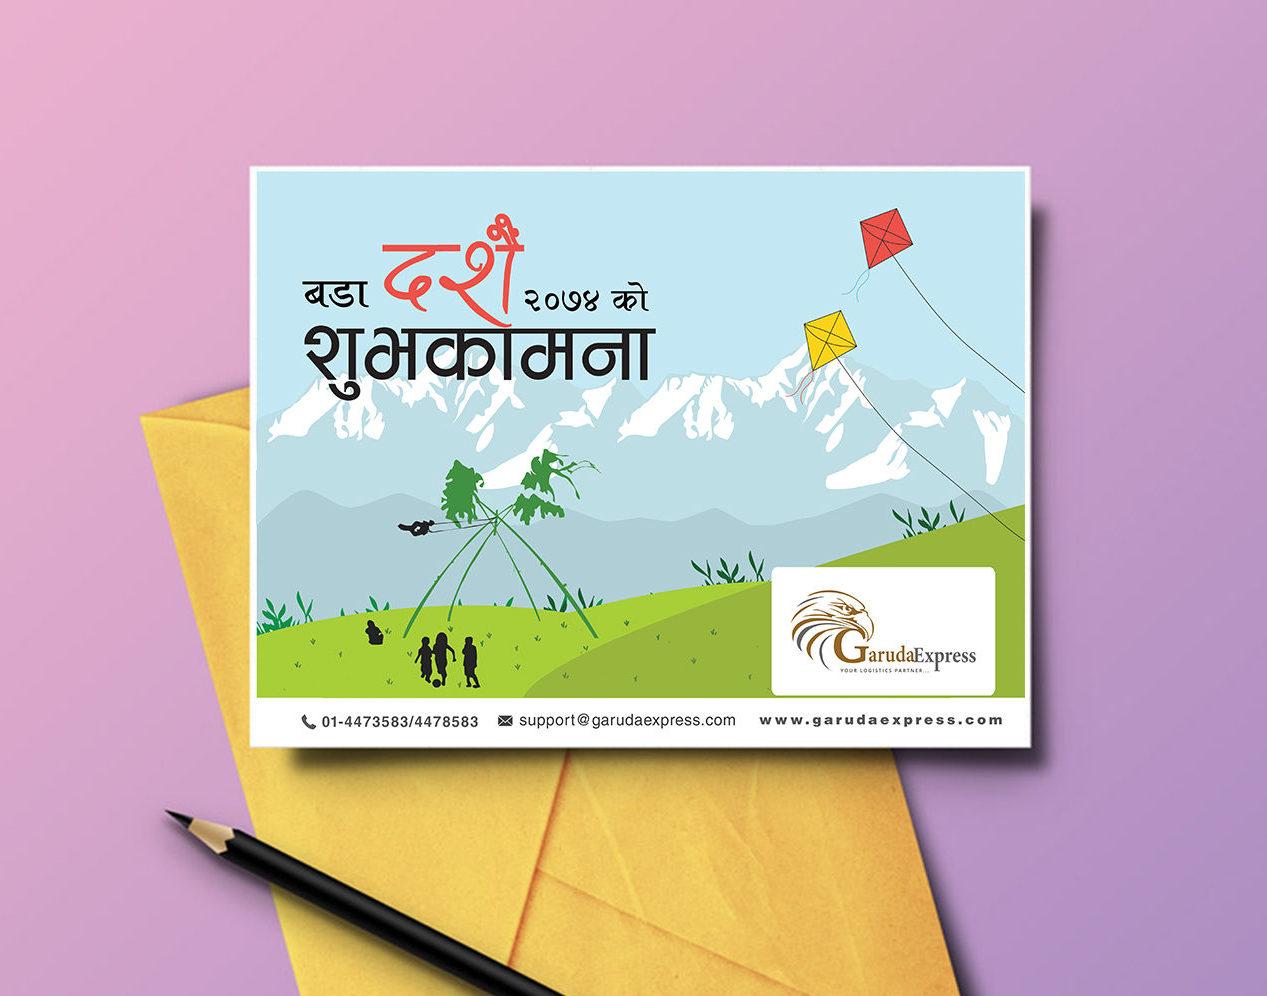 Greetings card design sudin dhakal dashain greetings card design m4hsunfo